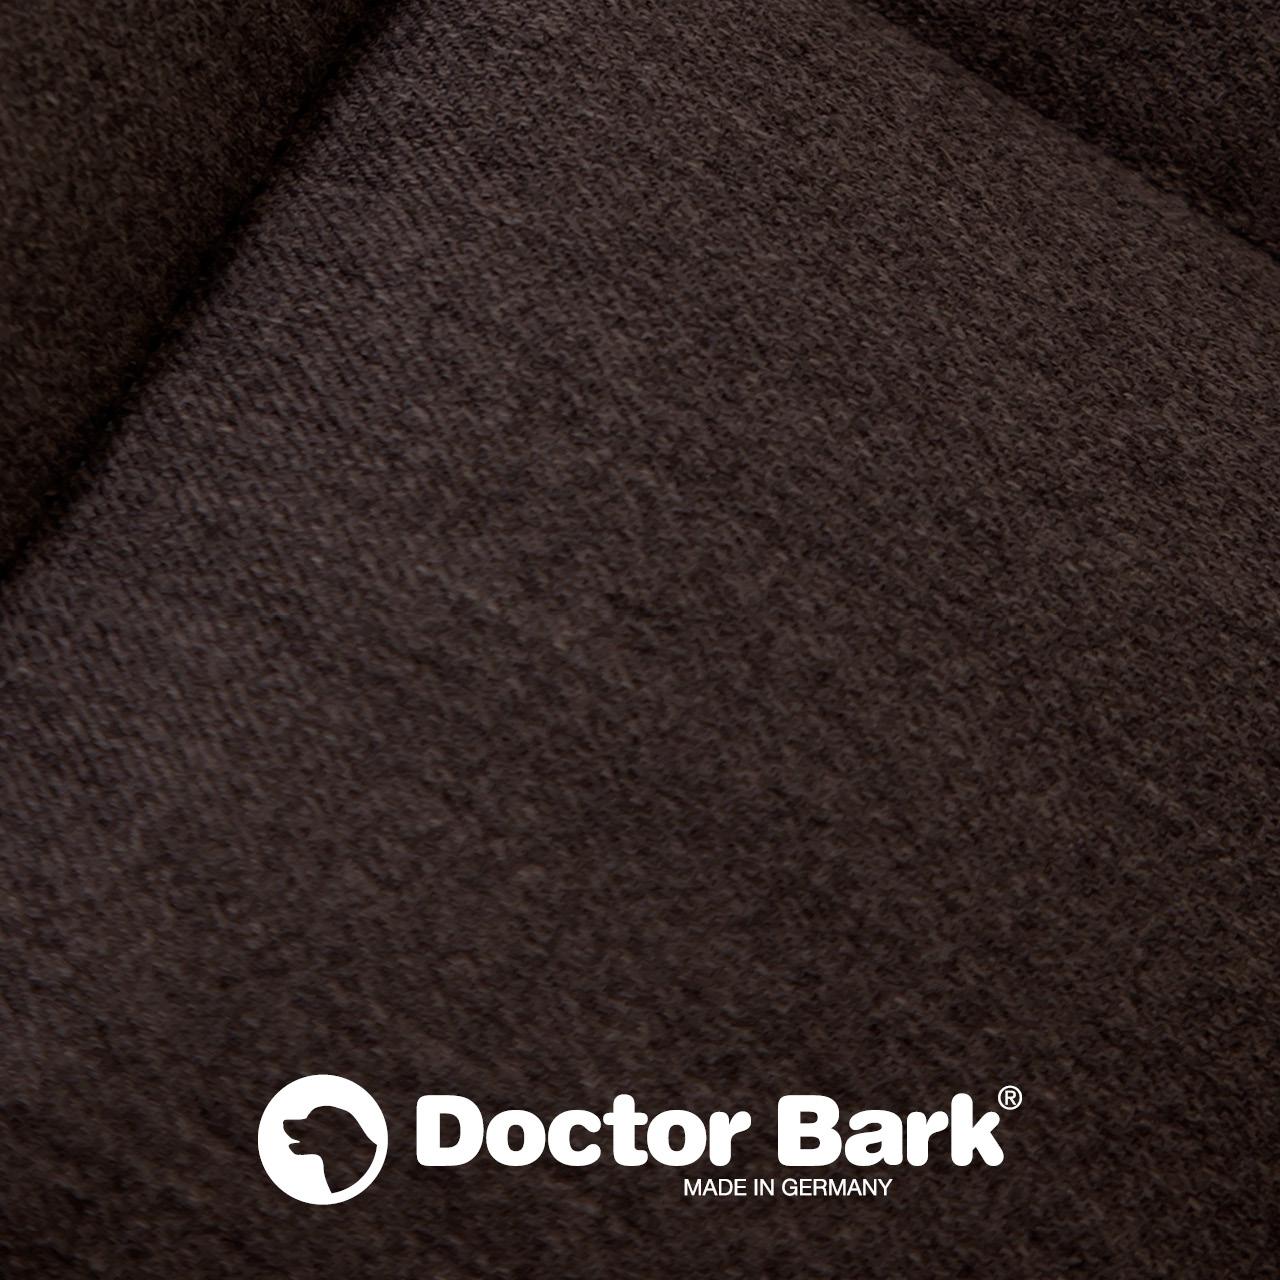 eckiges Doctor Bark Hundebett mit Rand Gr. L - braun